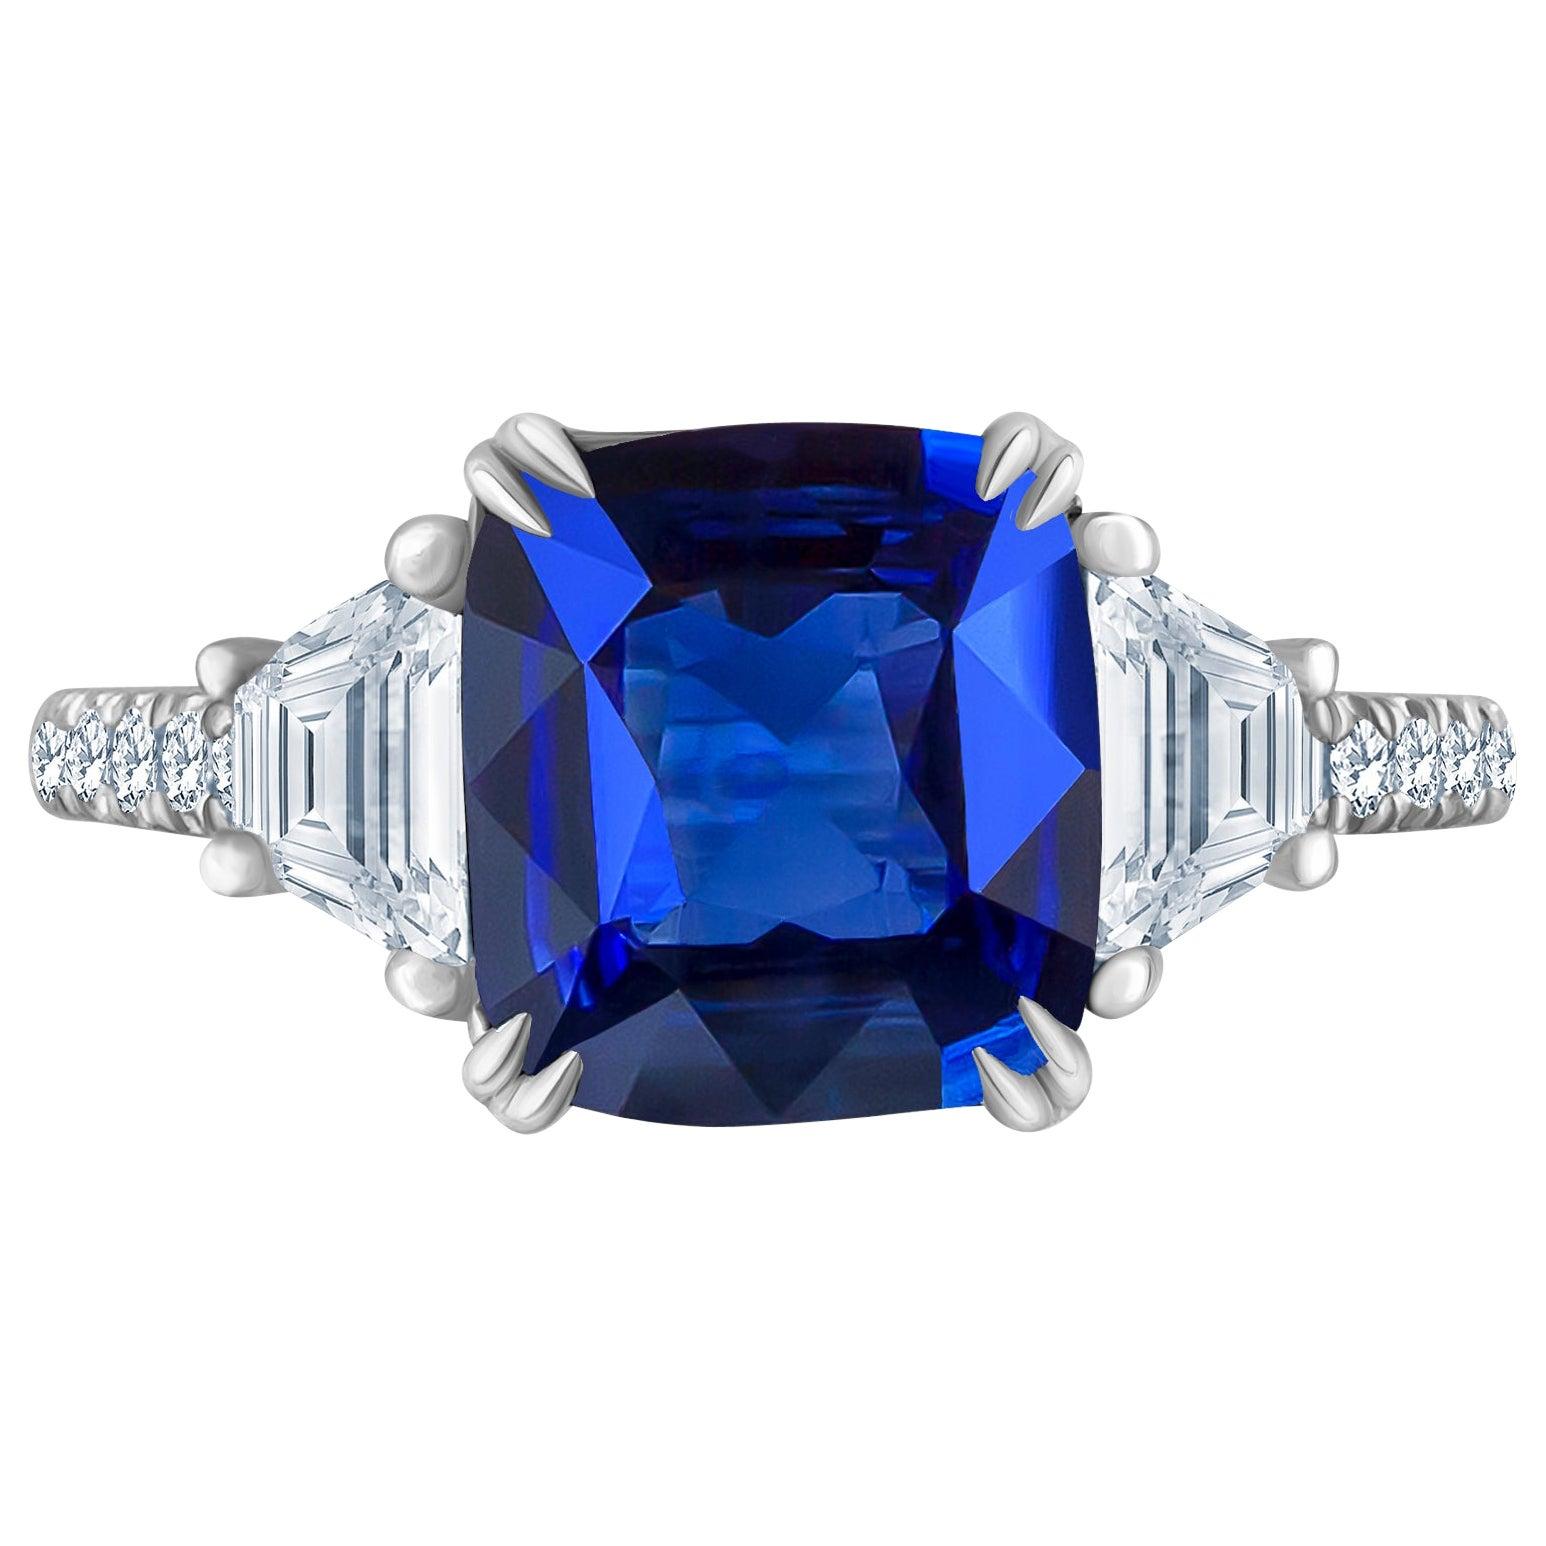 Emilio Jewelry 4.24 Carat Vivid Blue Sapphire Diamond Ring